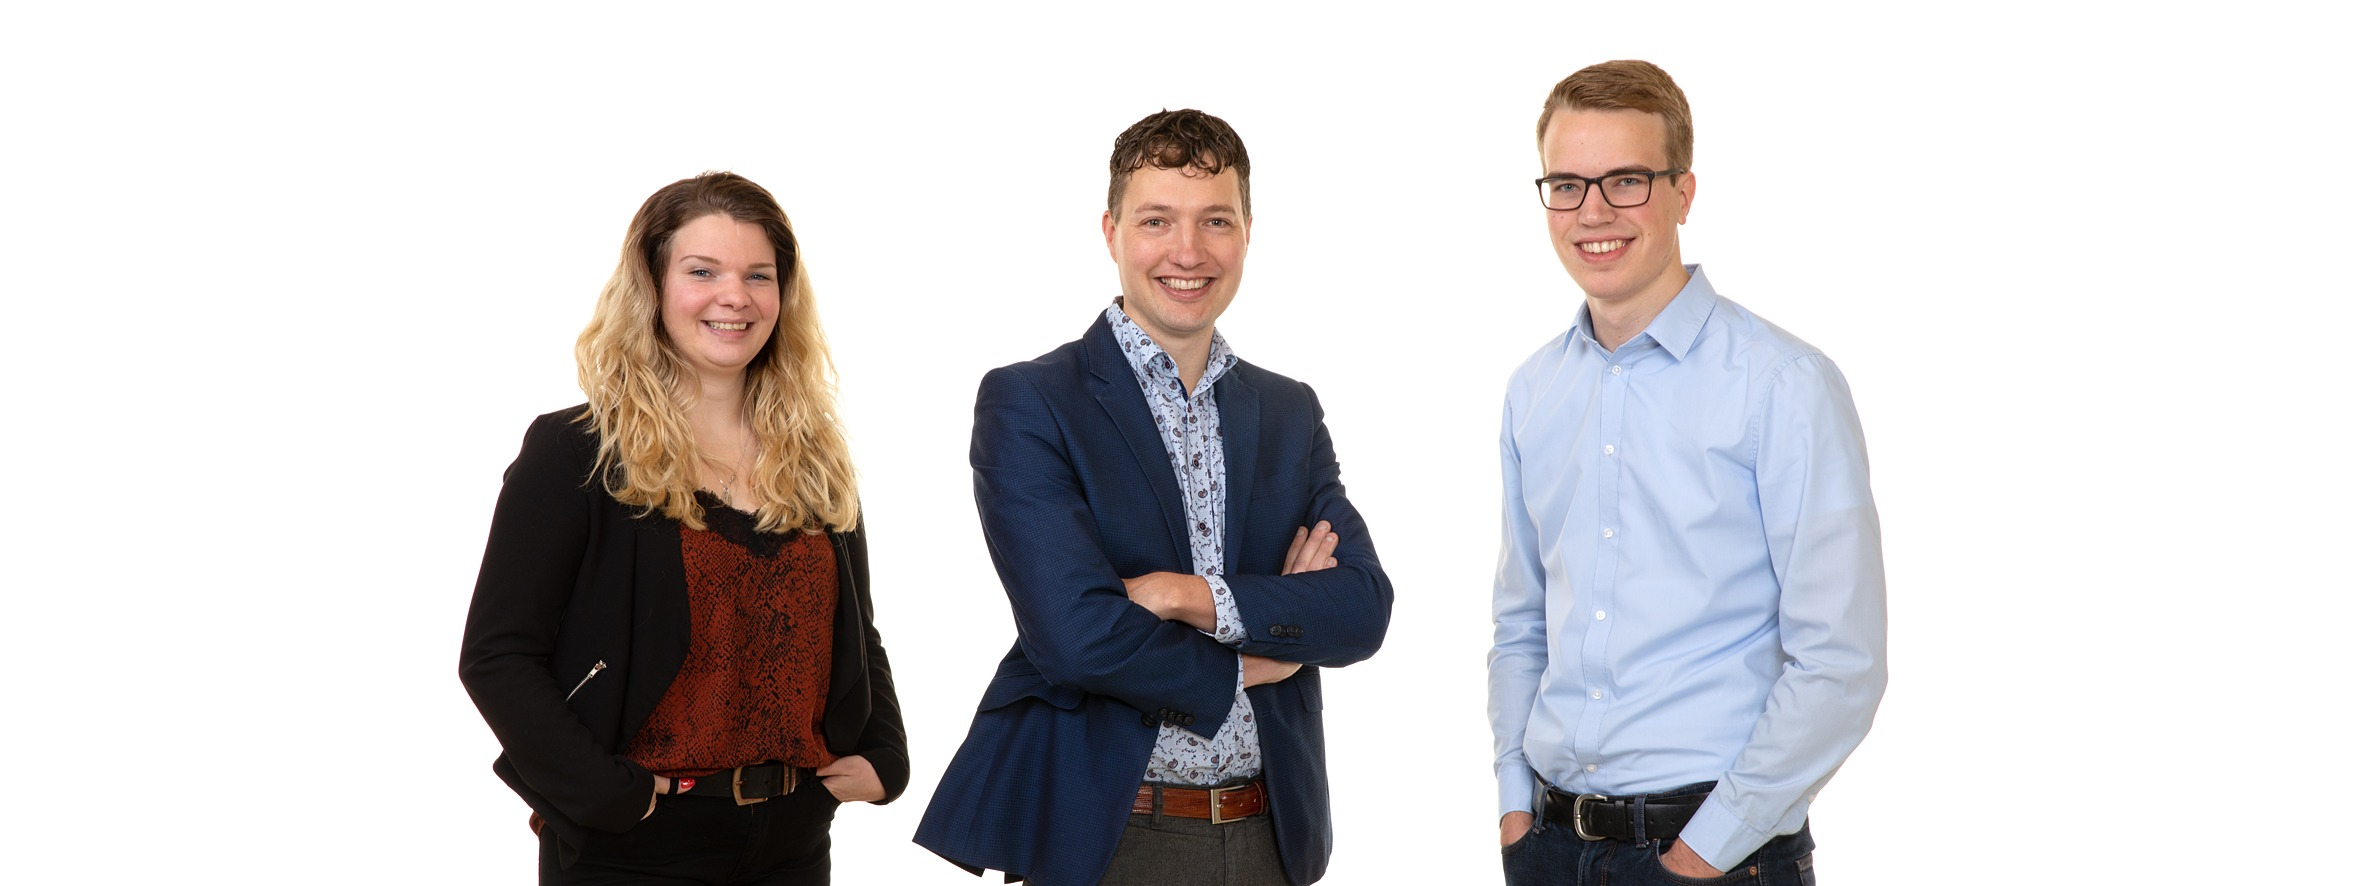 Team Groningen